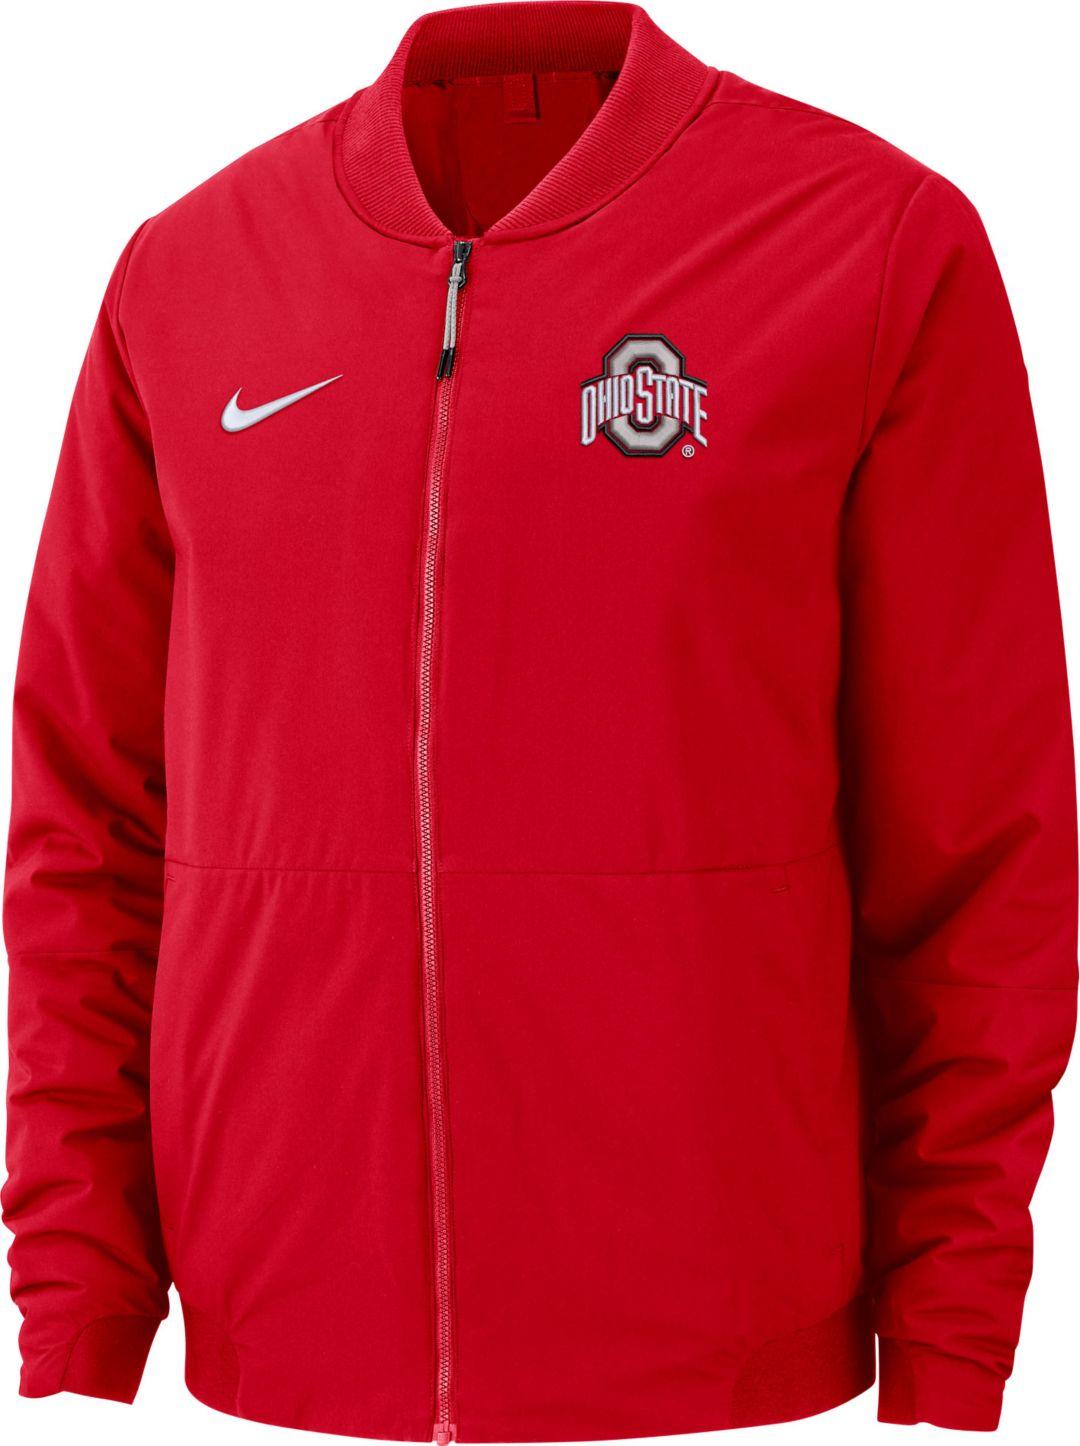 pretty nice 1eda3 b6bed Nike Men s Ohio State Buckeyes Scarlet Bomber Full-Zip Jacket 1